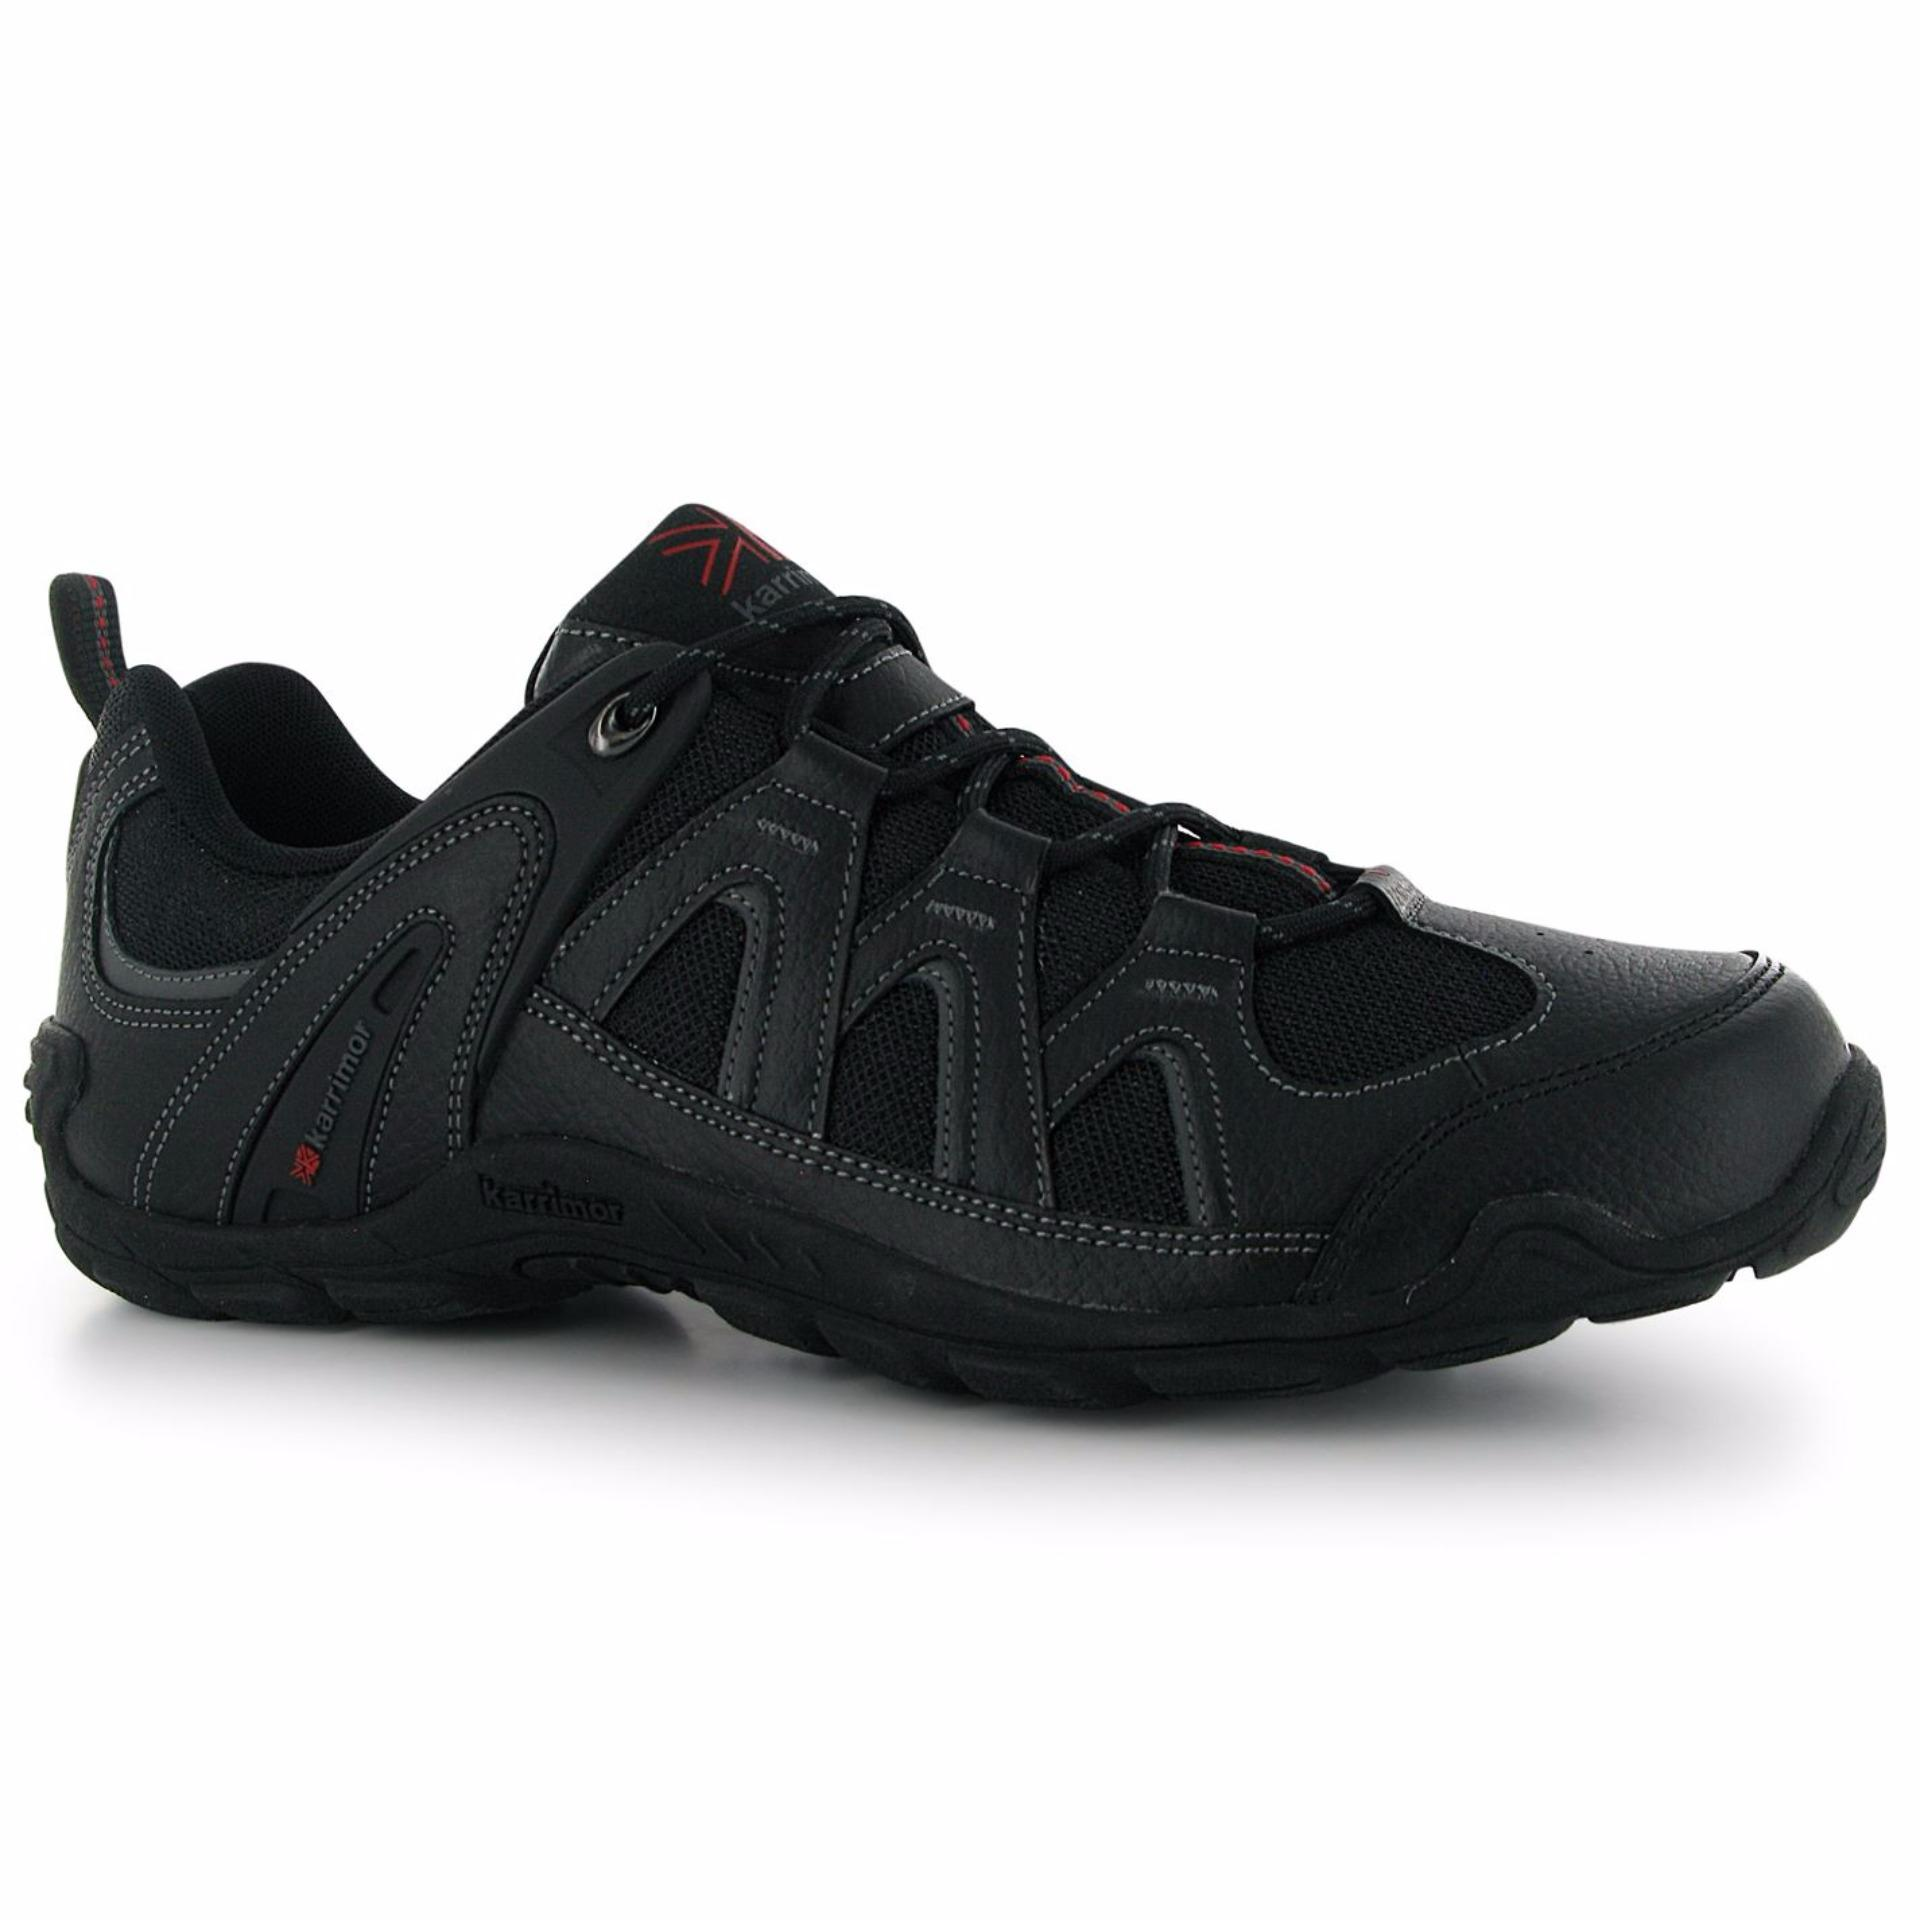 Harga Penawaran Karrimor Summit Leather Black Pencari Nike Tiempox Genio Ii Ic Shoes Hitam